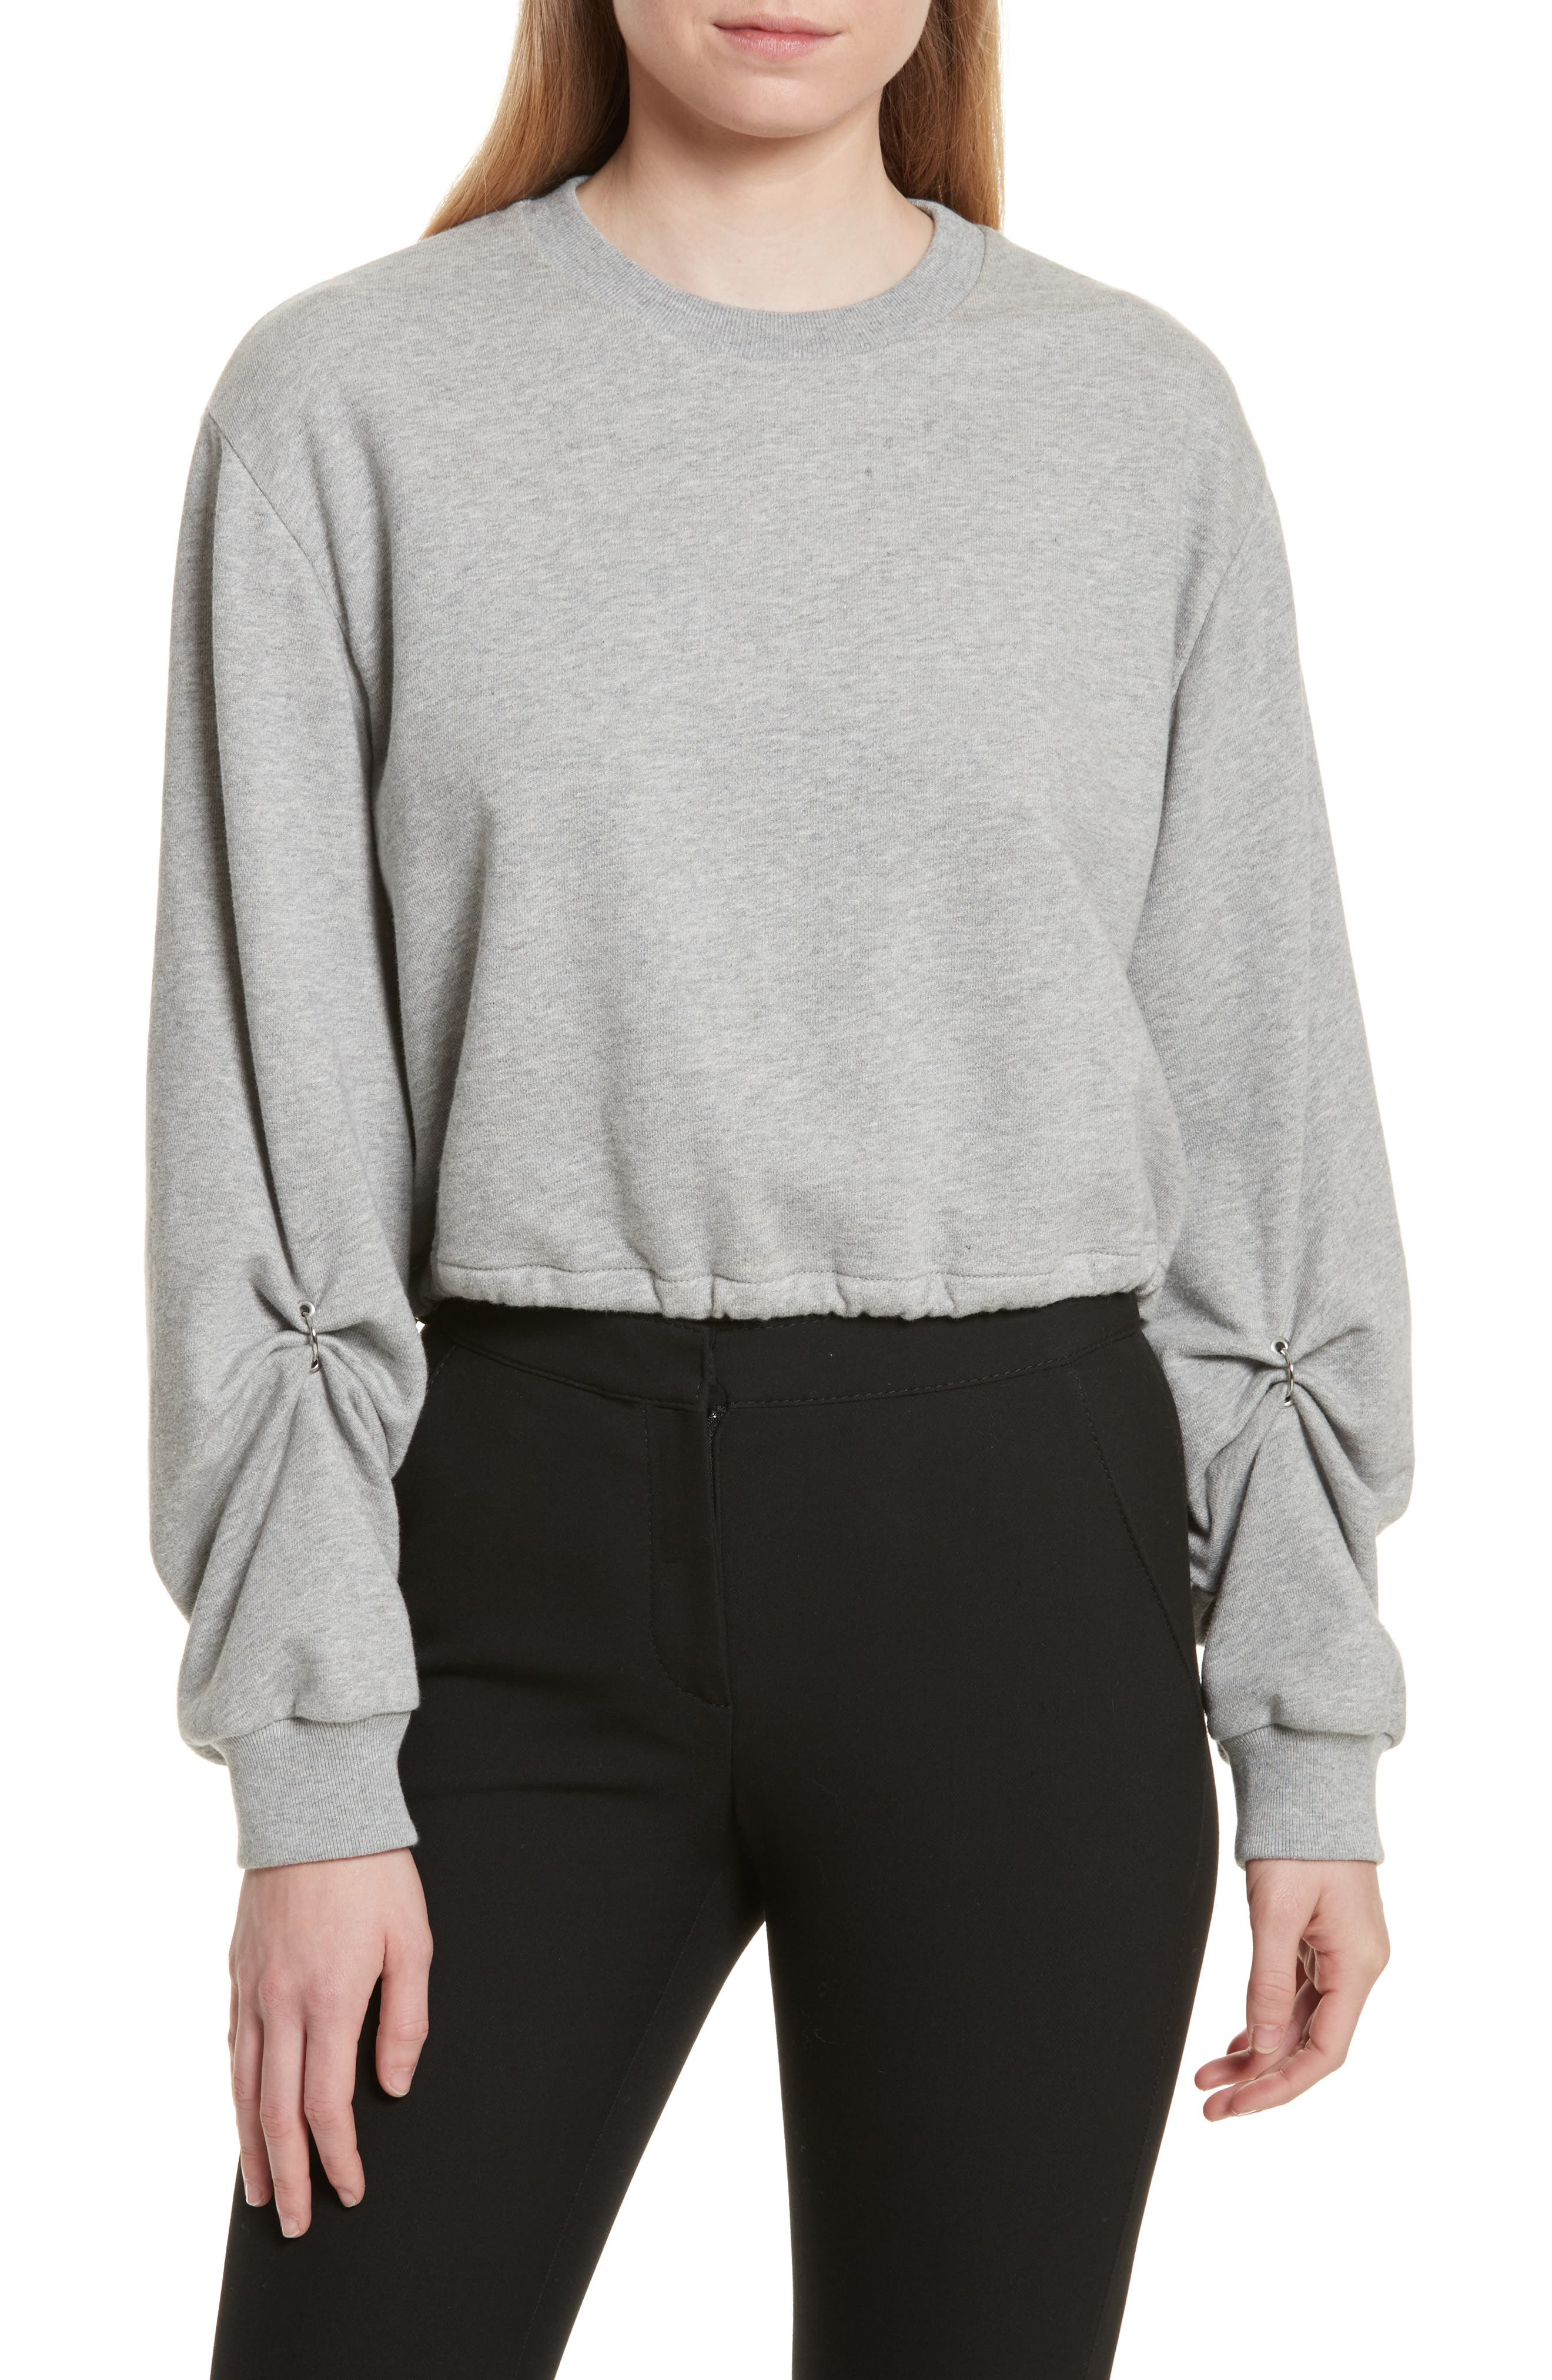 3.1 Phillip Lim Pierced Sleeve Sweatshirt